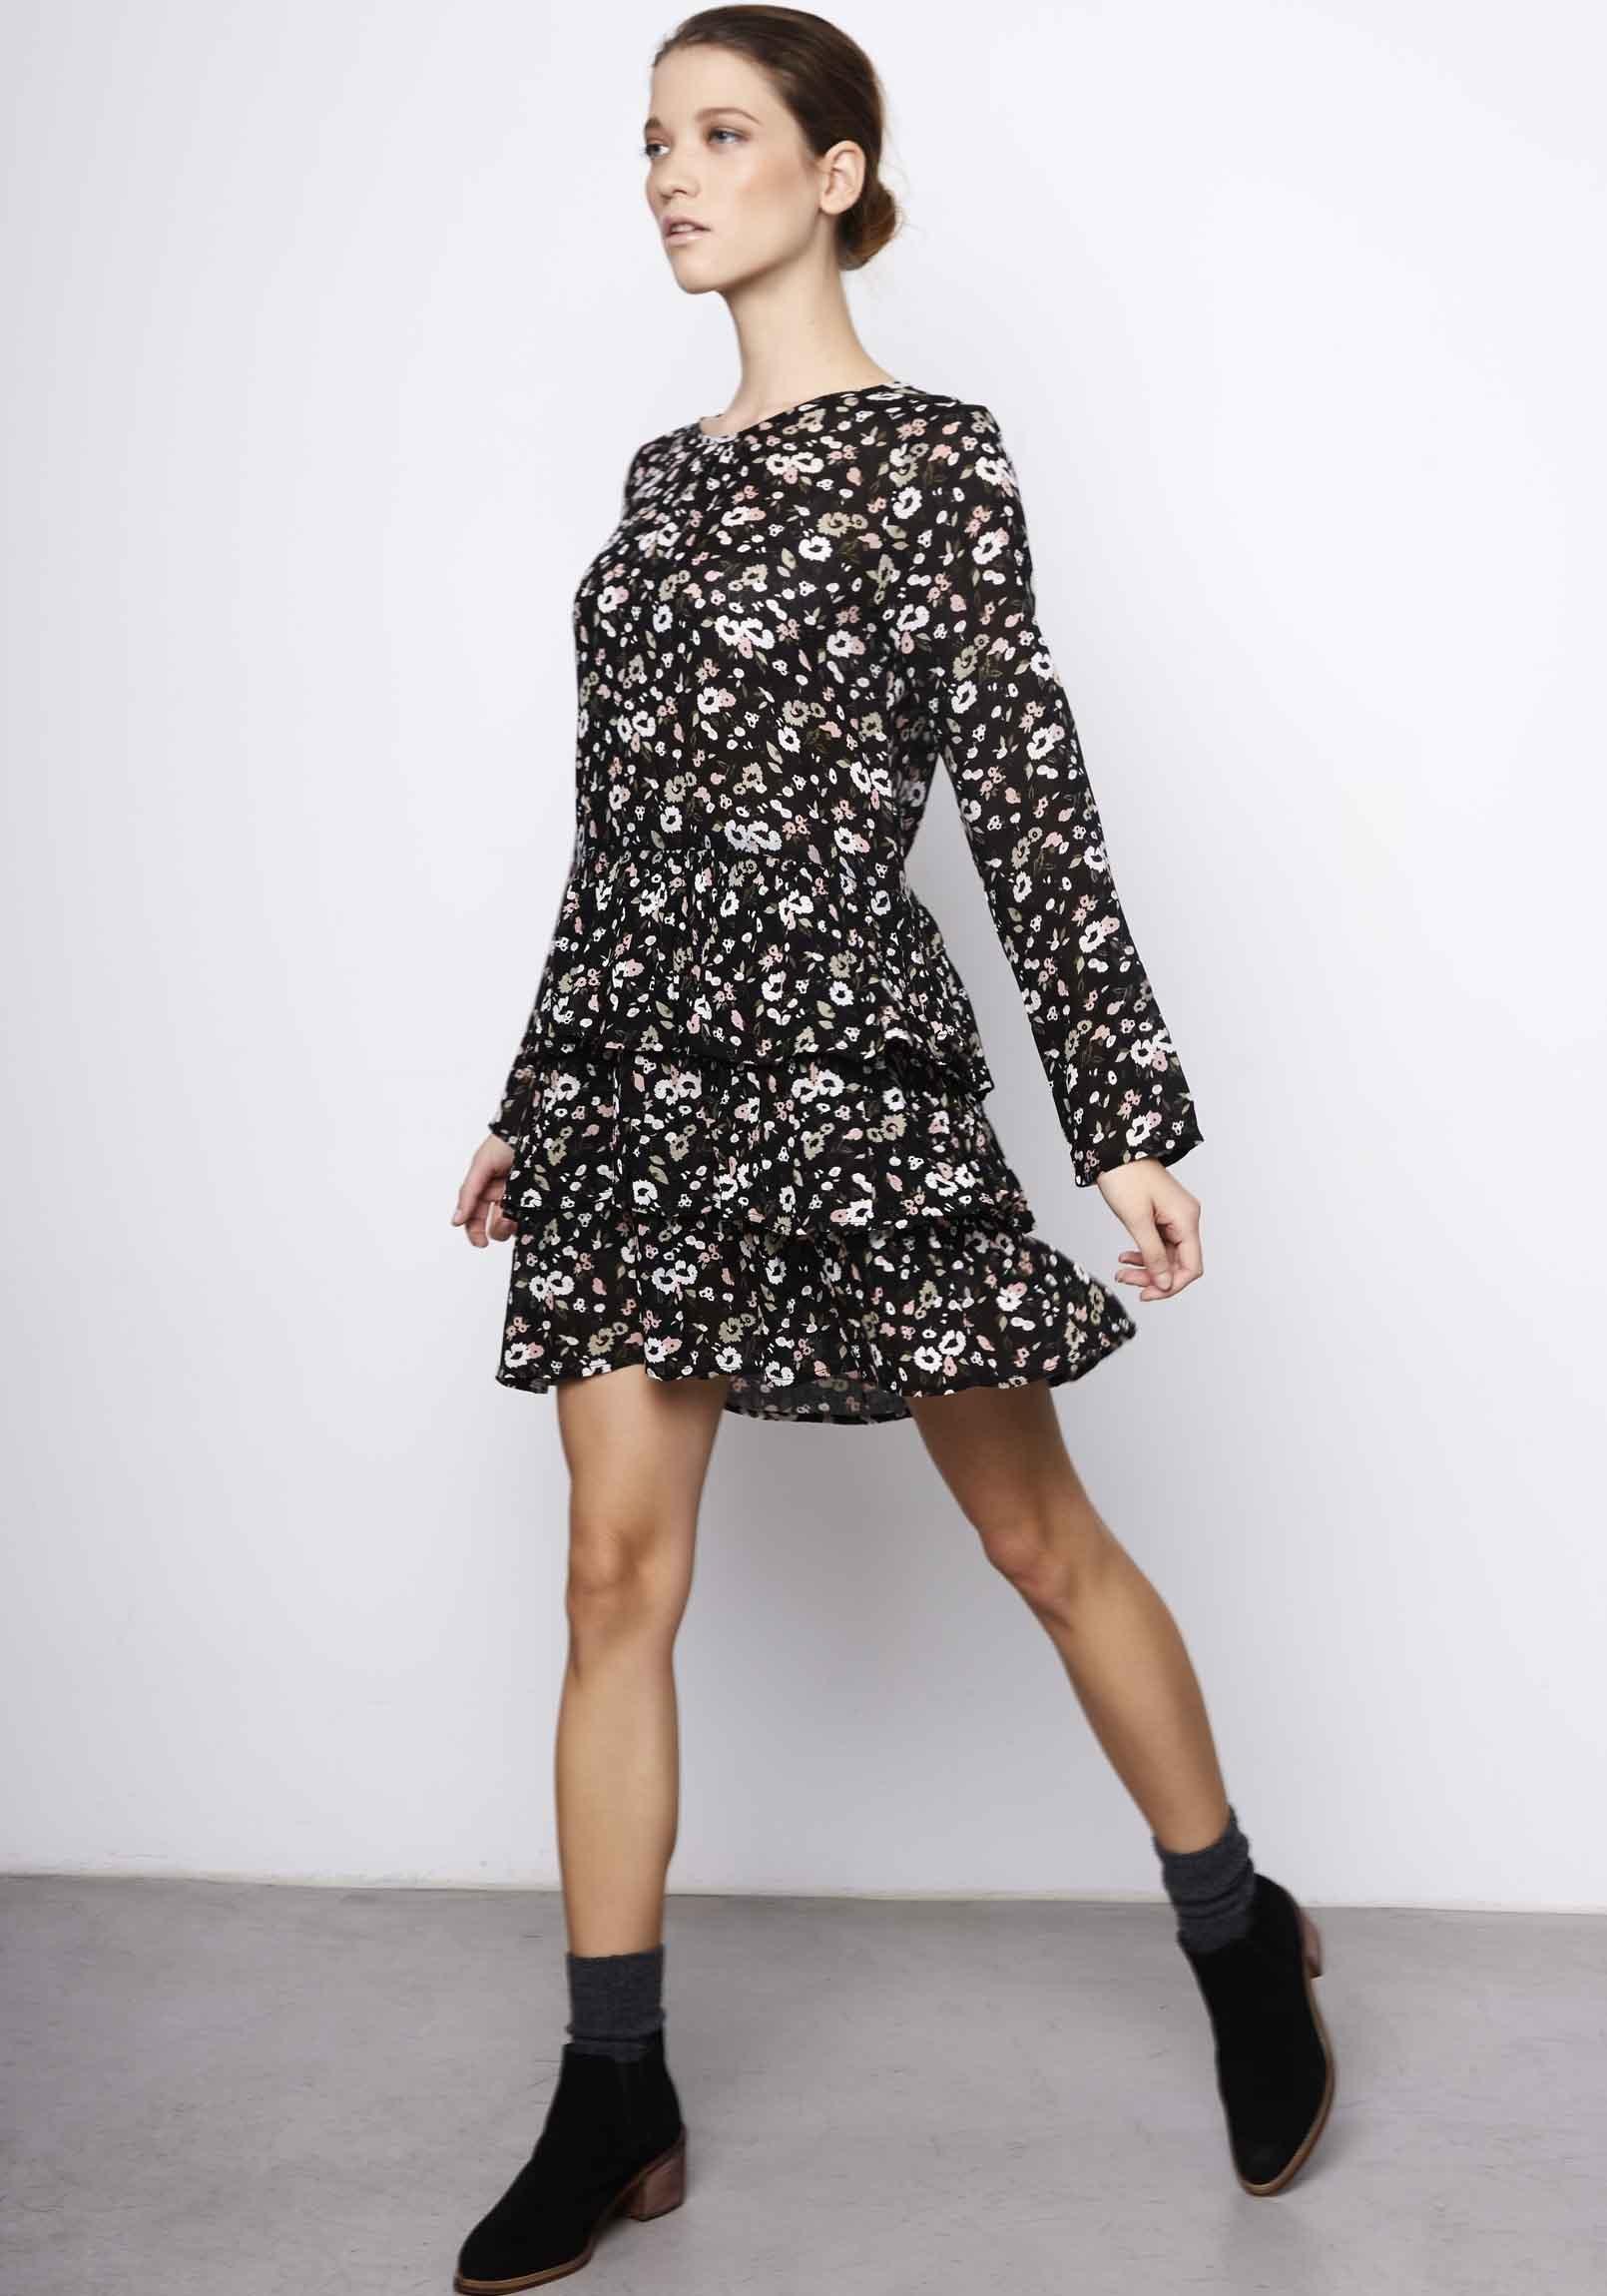 0b98ab825786 COMPANIA FANTASTICA - Γυναικεία Ρούχα DARLING Mina Siampi Καλαμάτα